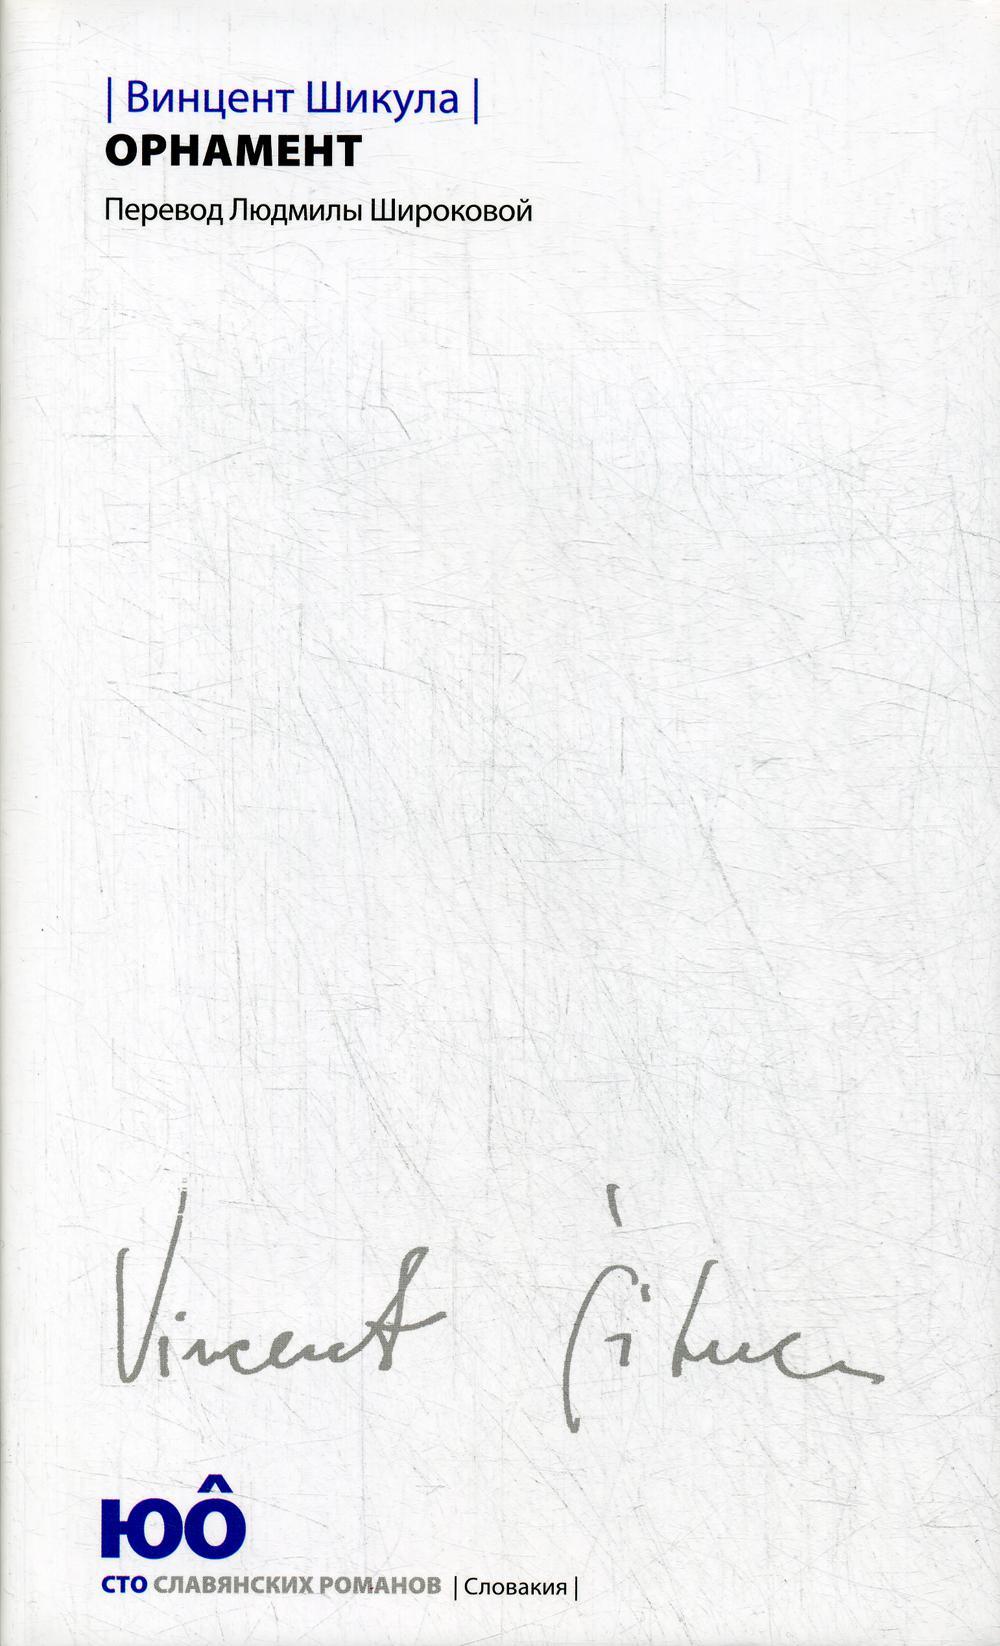 Шикула В. Орнамент: Роман/ Пер. со словацк., послесл. Л. Широковой; отв. ред.: Е. Сагалович, Ю. Фридштейн